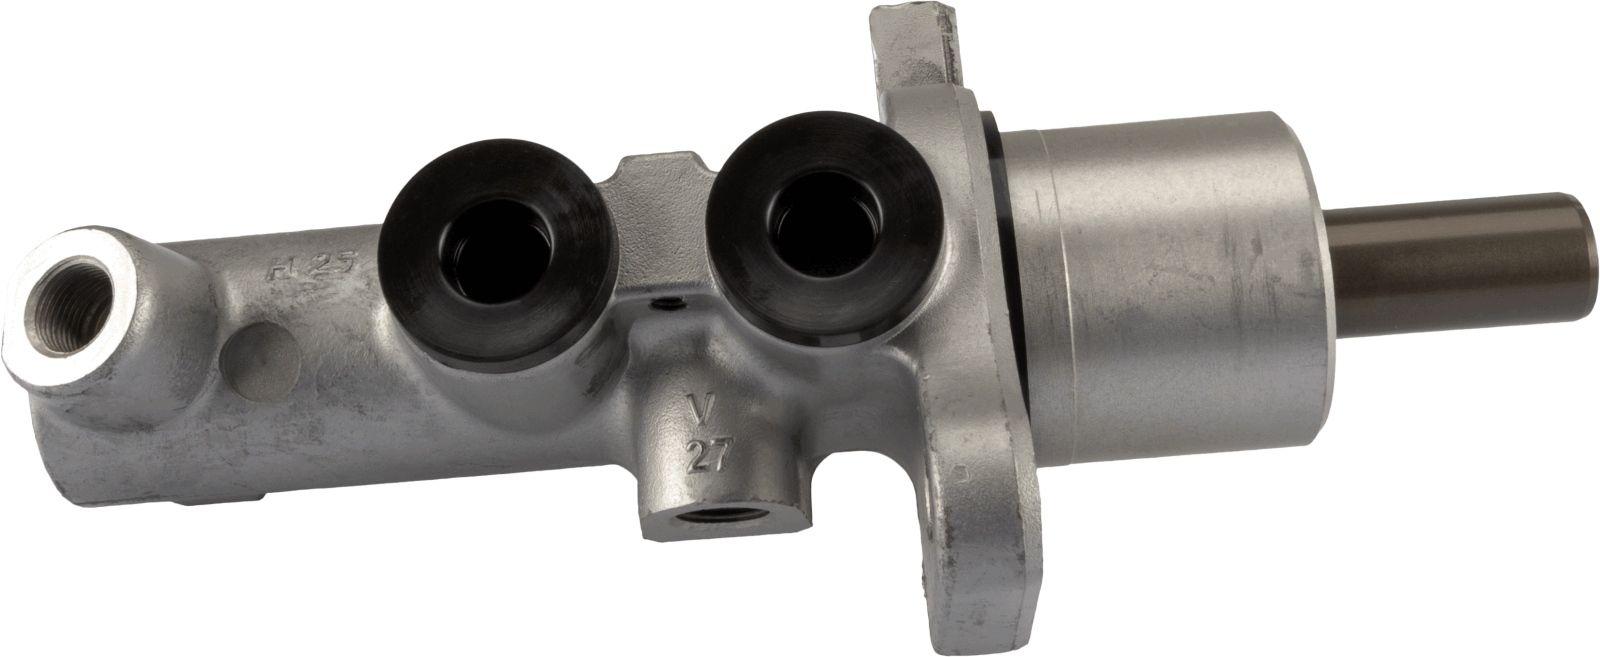 Hovedbremsesylinder PMN200 kjøp - 24/7